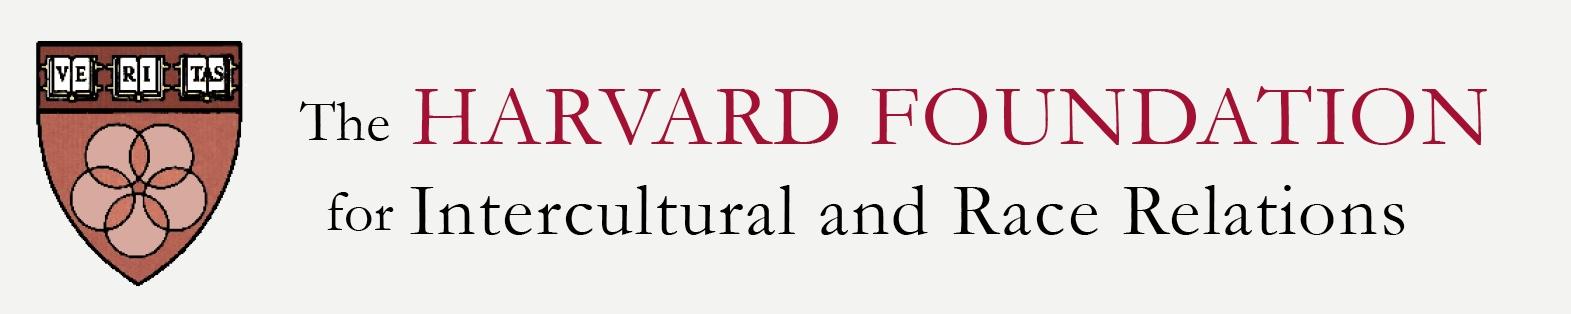 The Harvard Foundation